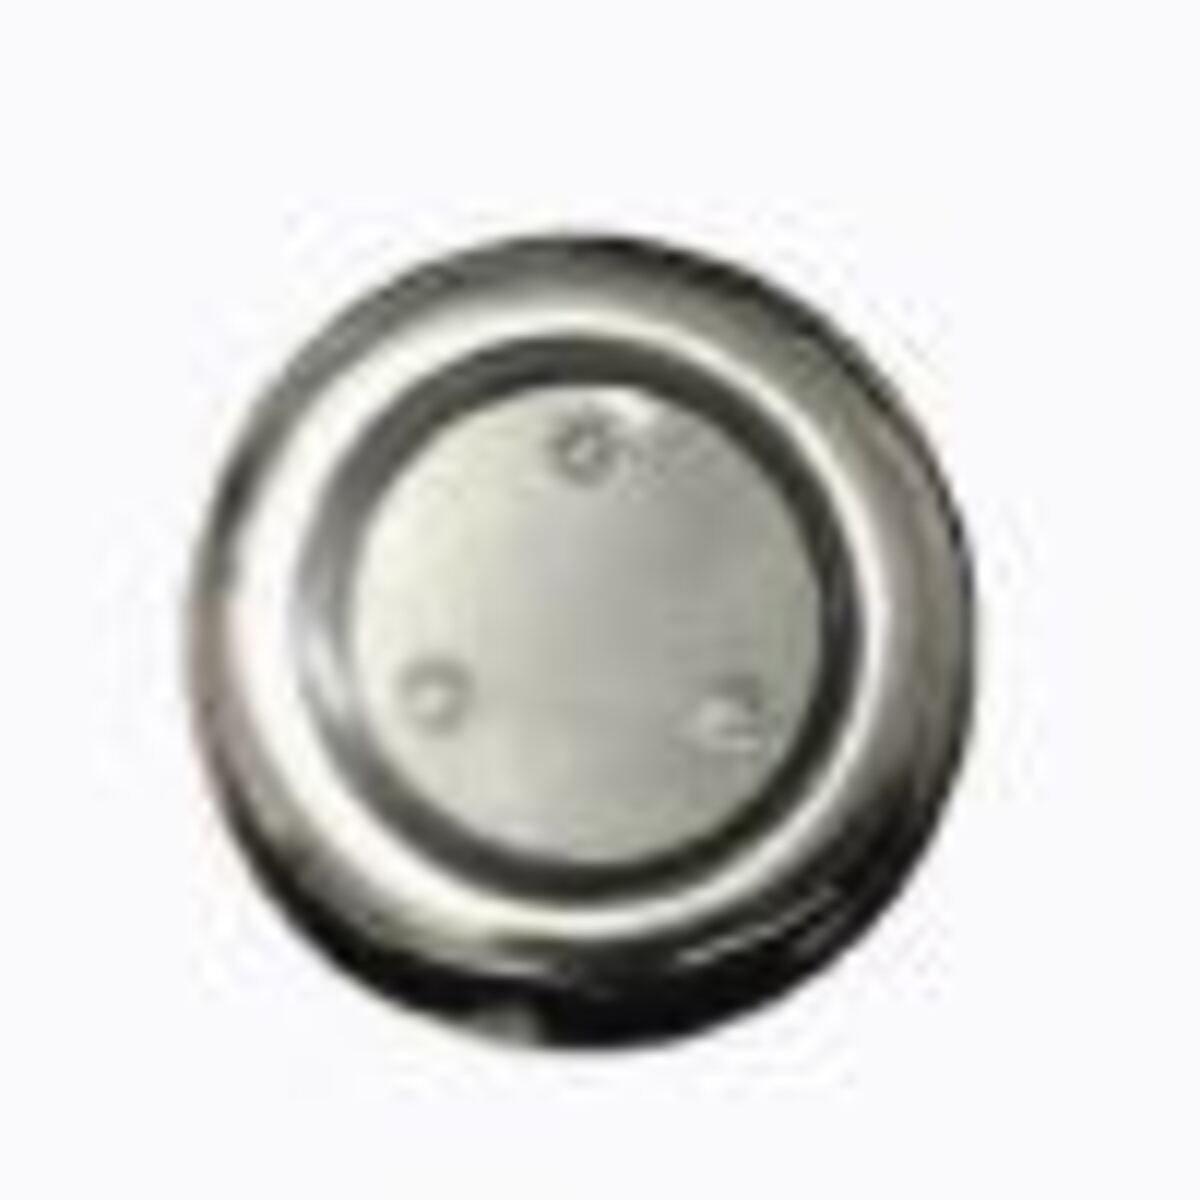 "Refletor Mini Steel Square Led 3 Branco Inox com Plug 1/2"" Pooltec"